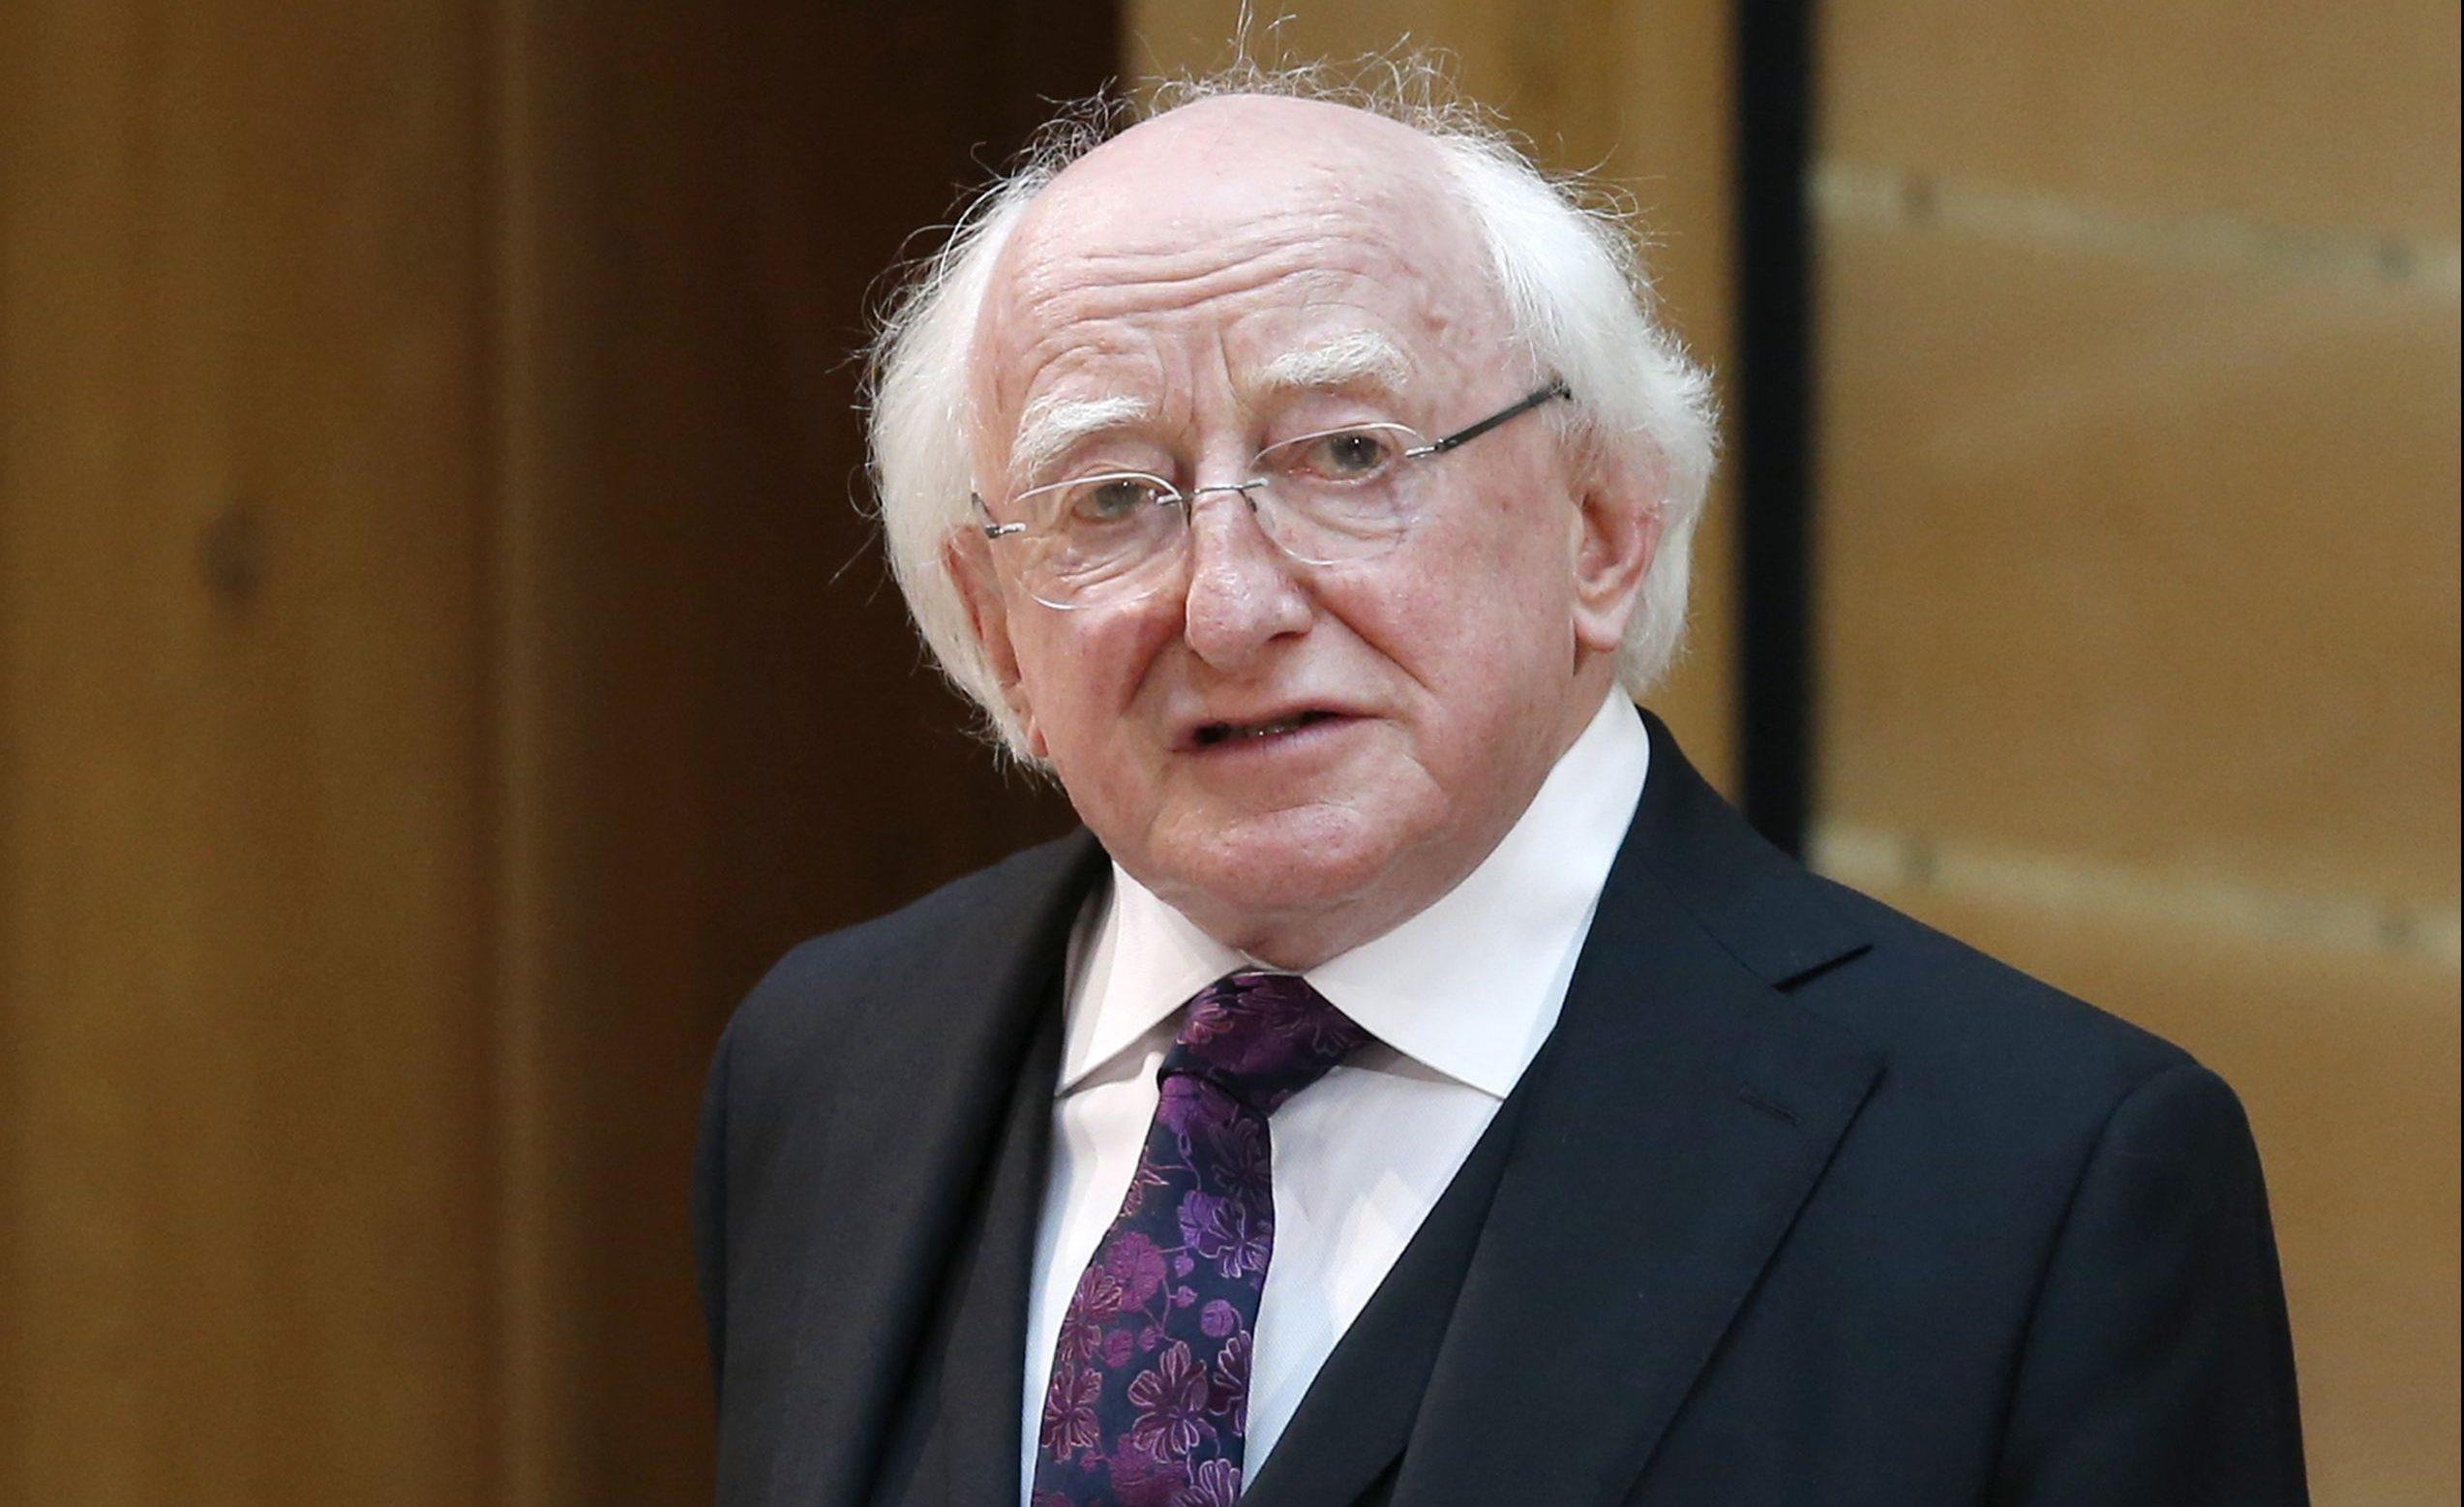 Irish president Michael D Higgins addresses MSPs in the main chamber of the Scottish Parliament.